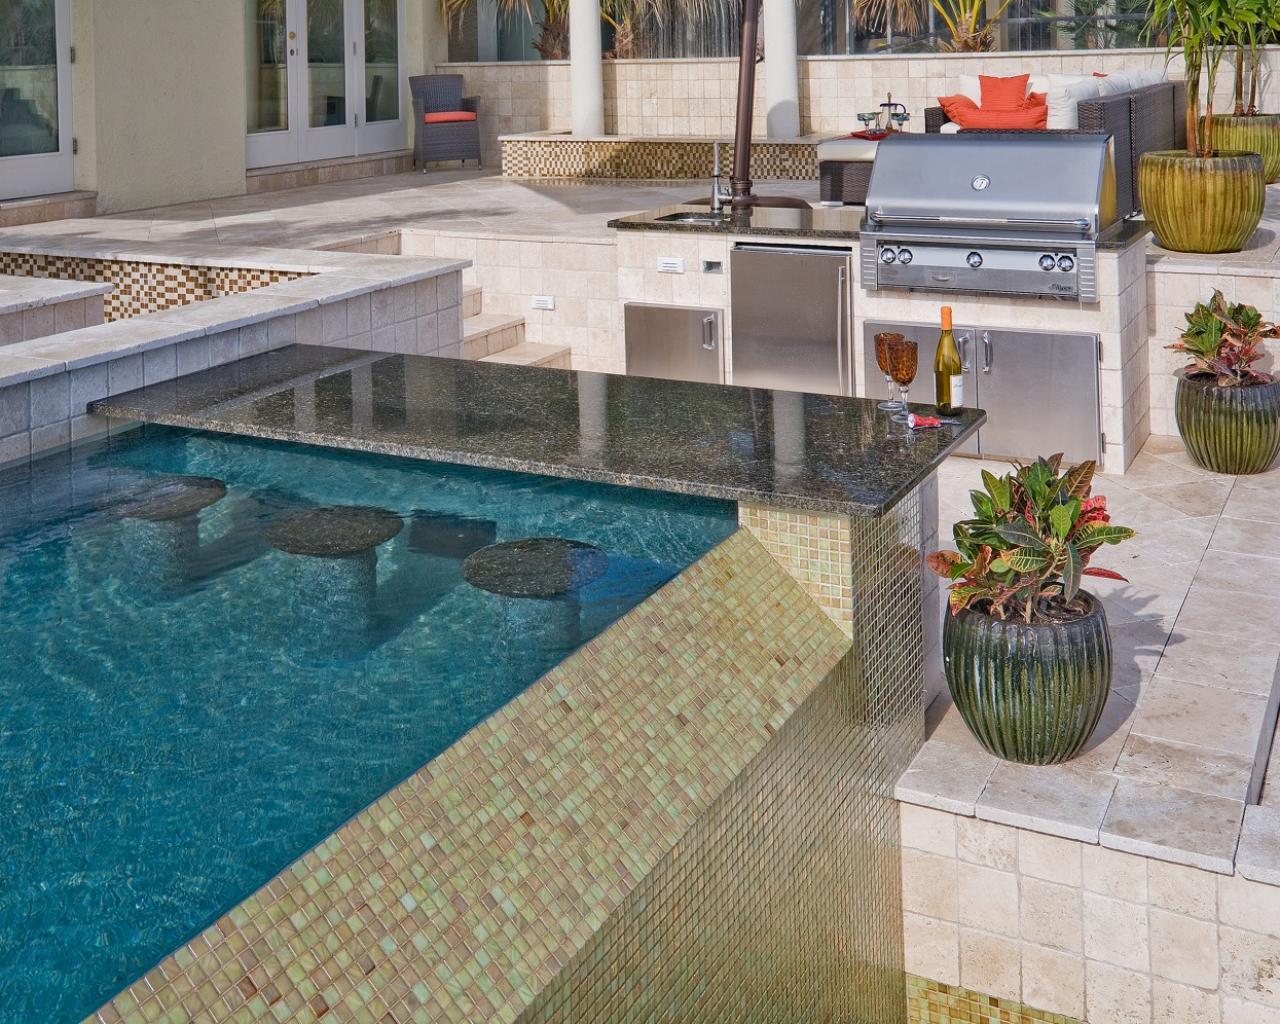 10 gorgeous backyard kitchen designs diy network blog made bountiful buffet space